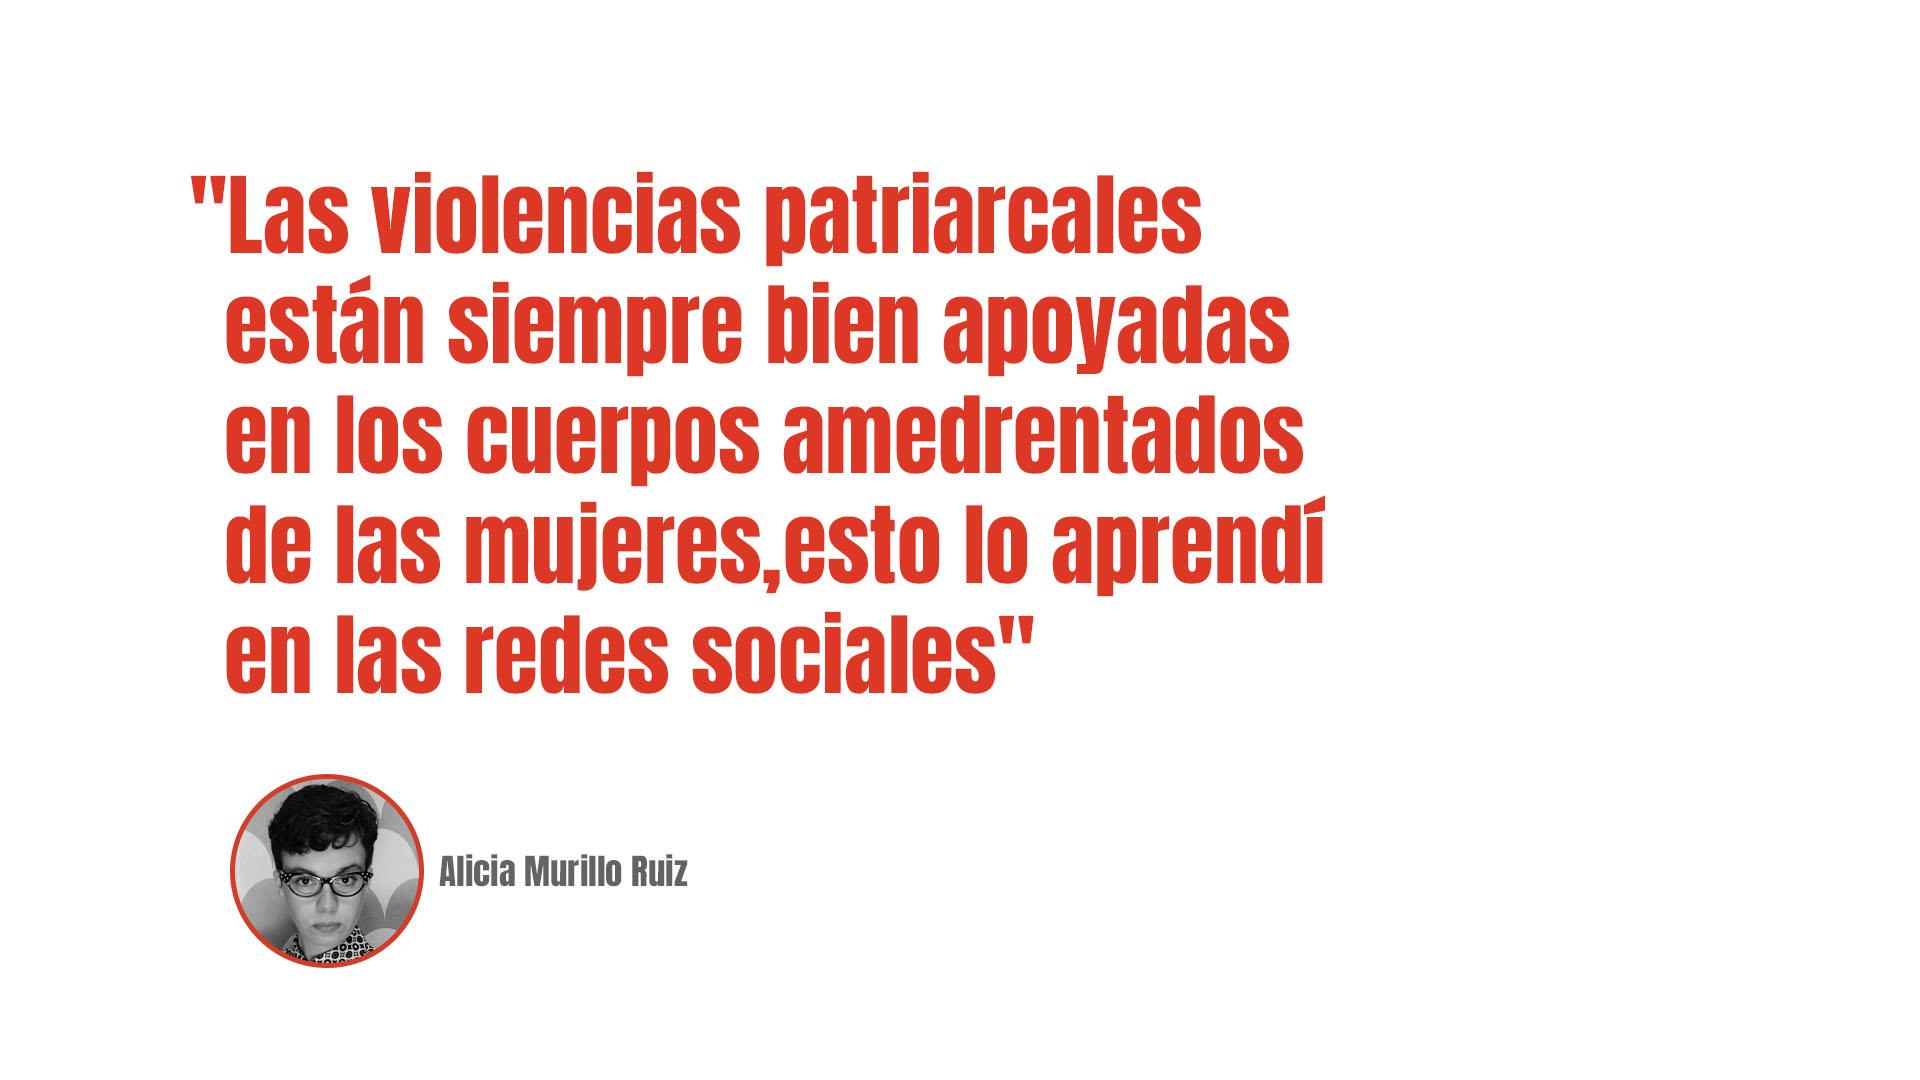 Alicia Murillo Ruiz: Mujeres, al REDil